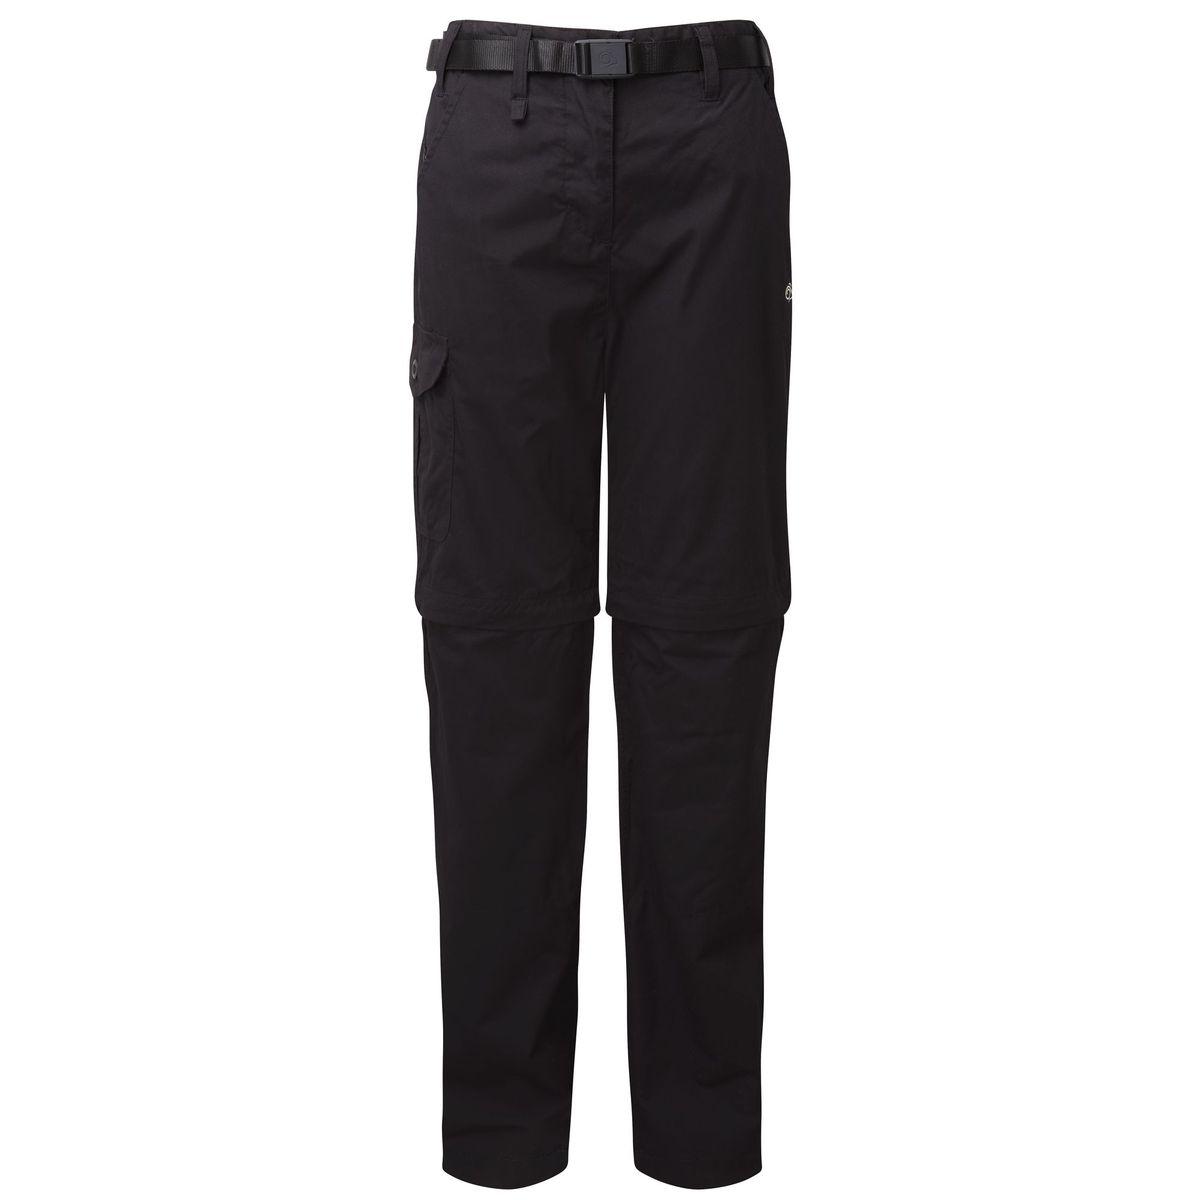 Pantalon convertible CLASSIC KIWI